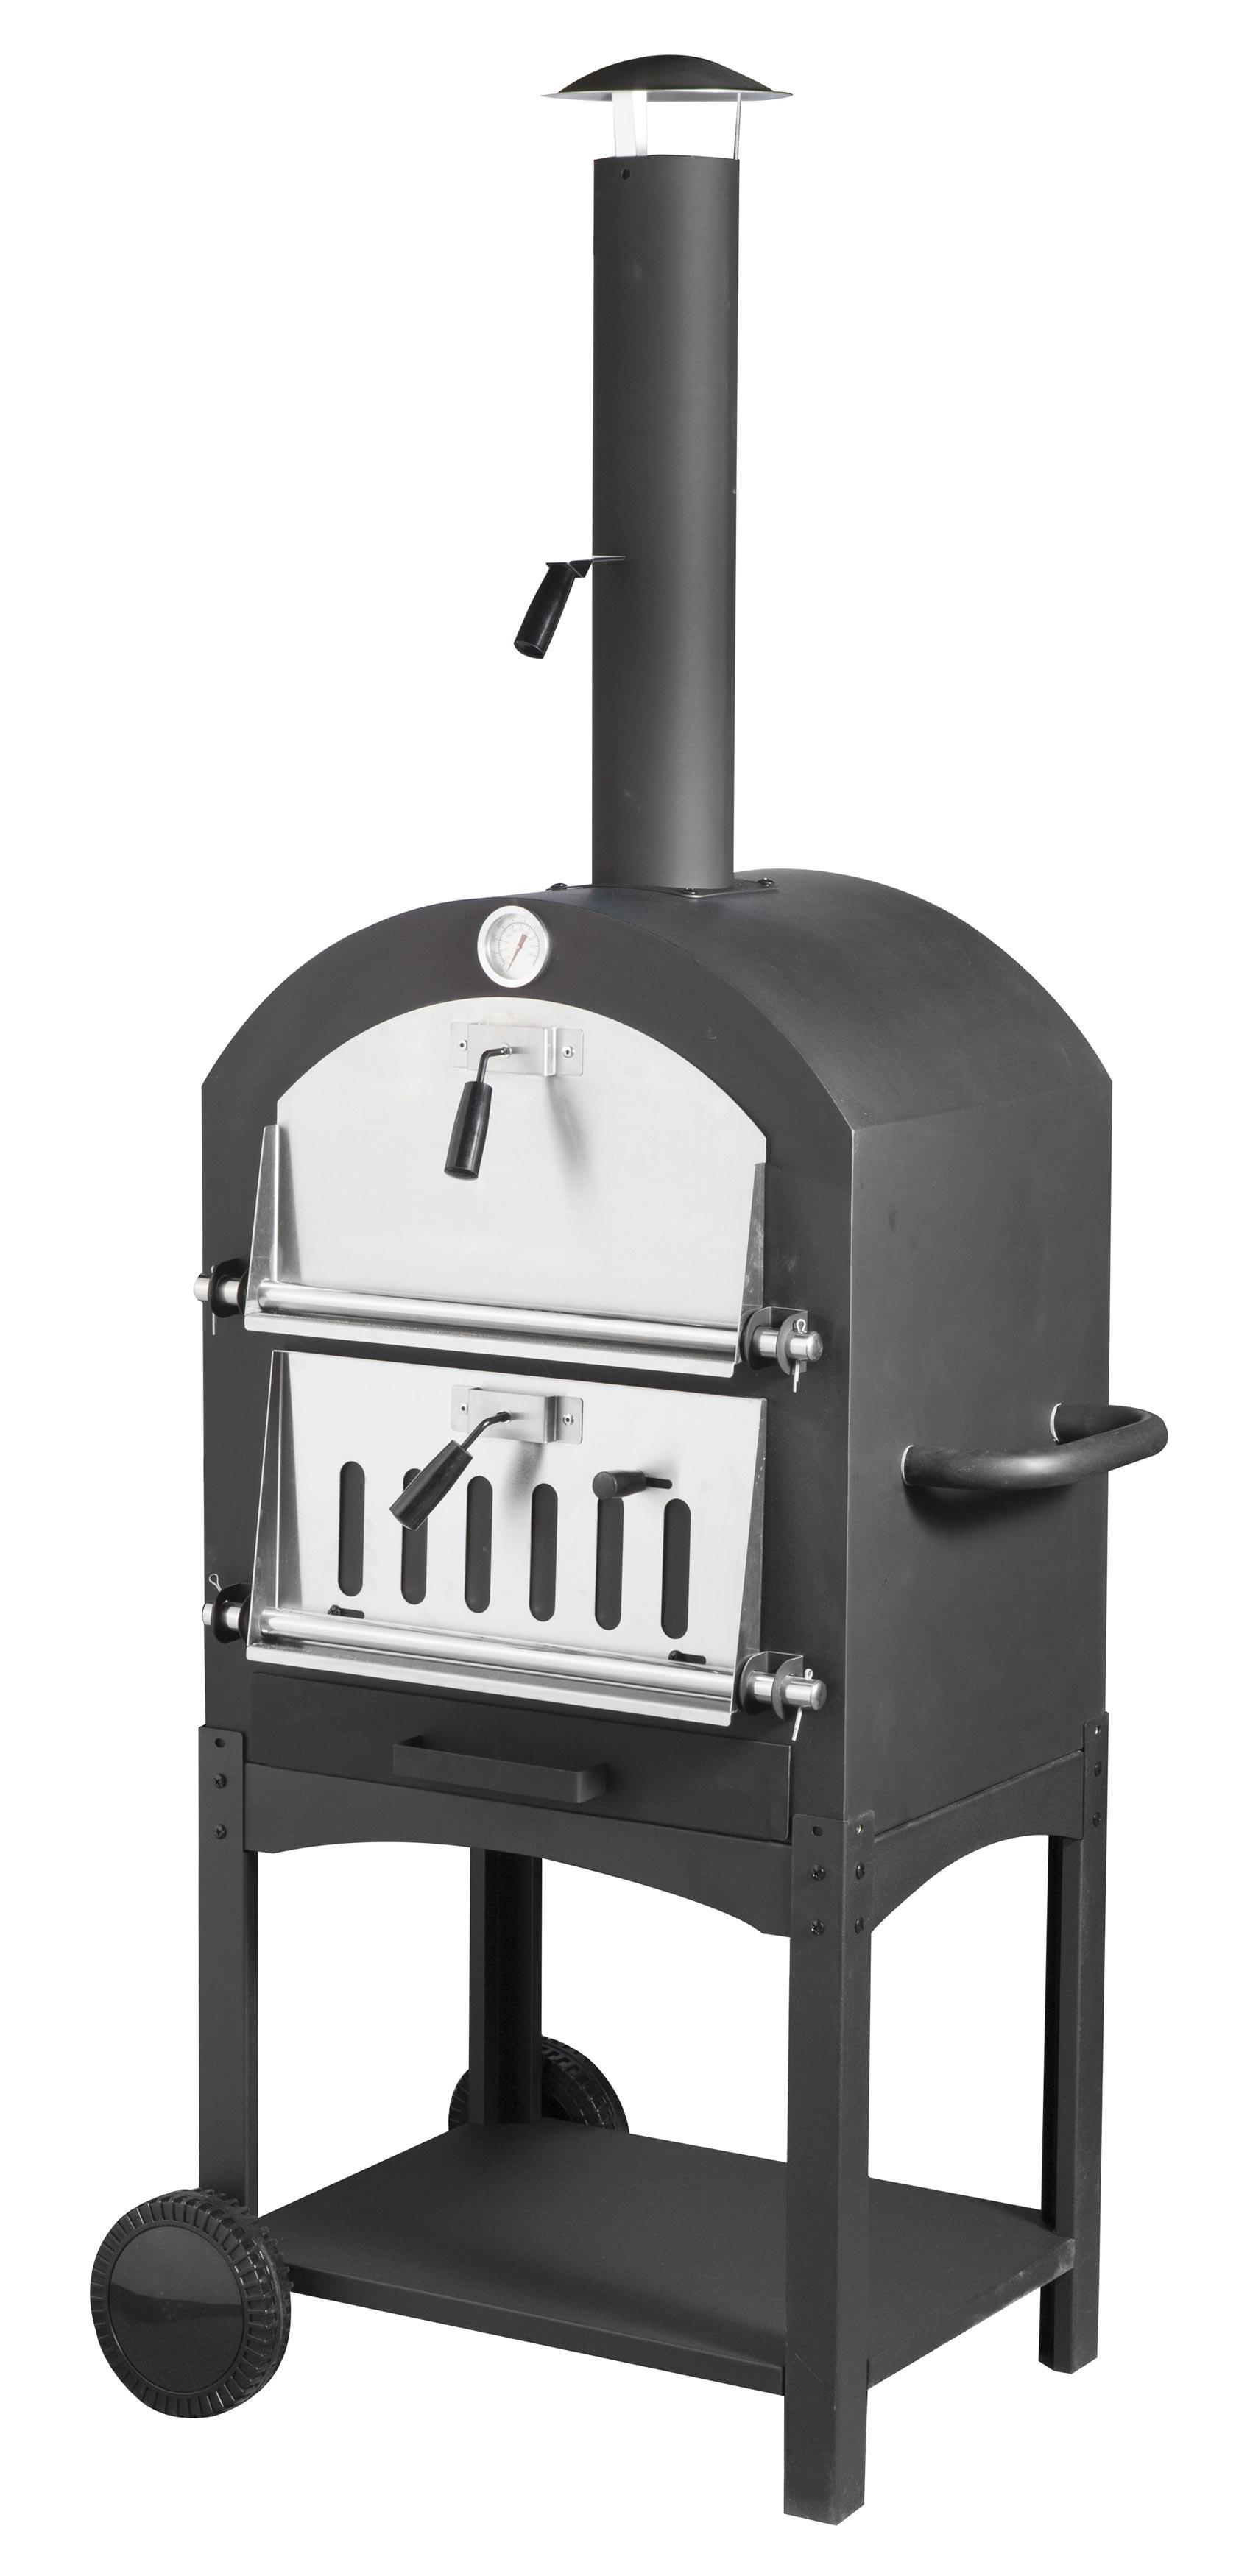 Pizzaofen / Brotbackofen / Flammkuchenofen Trapani mit Pizzastein Bild 1